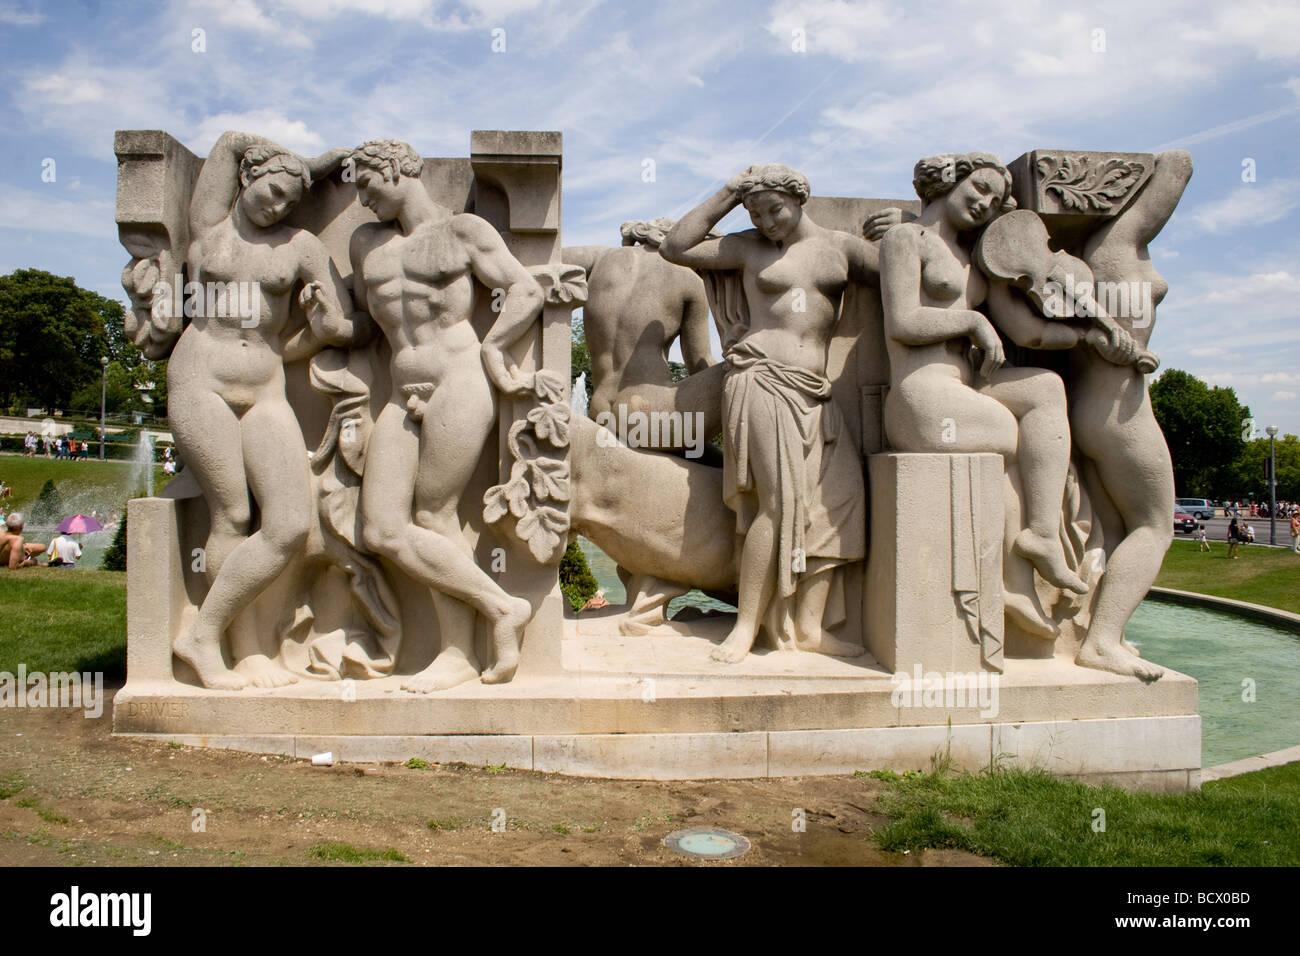 Sculpture in the Trocadero, Paris, France - Stock Image